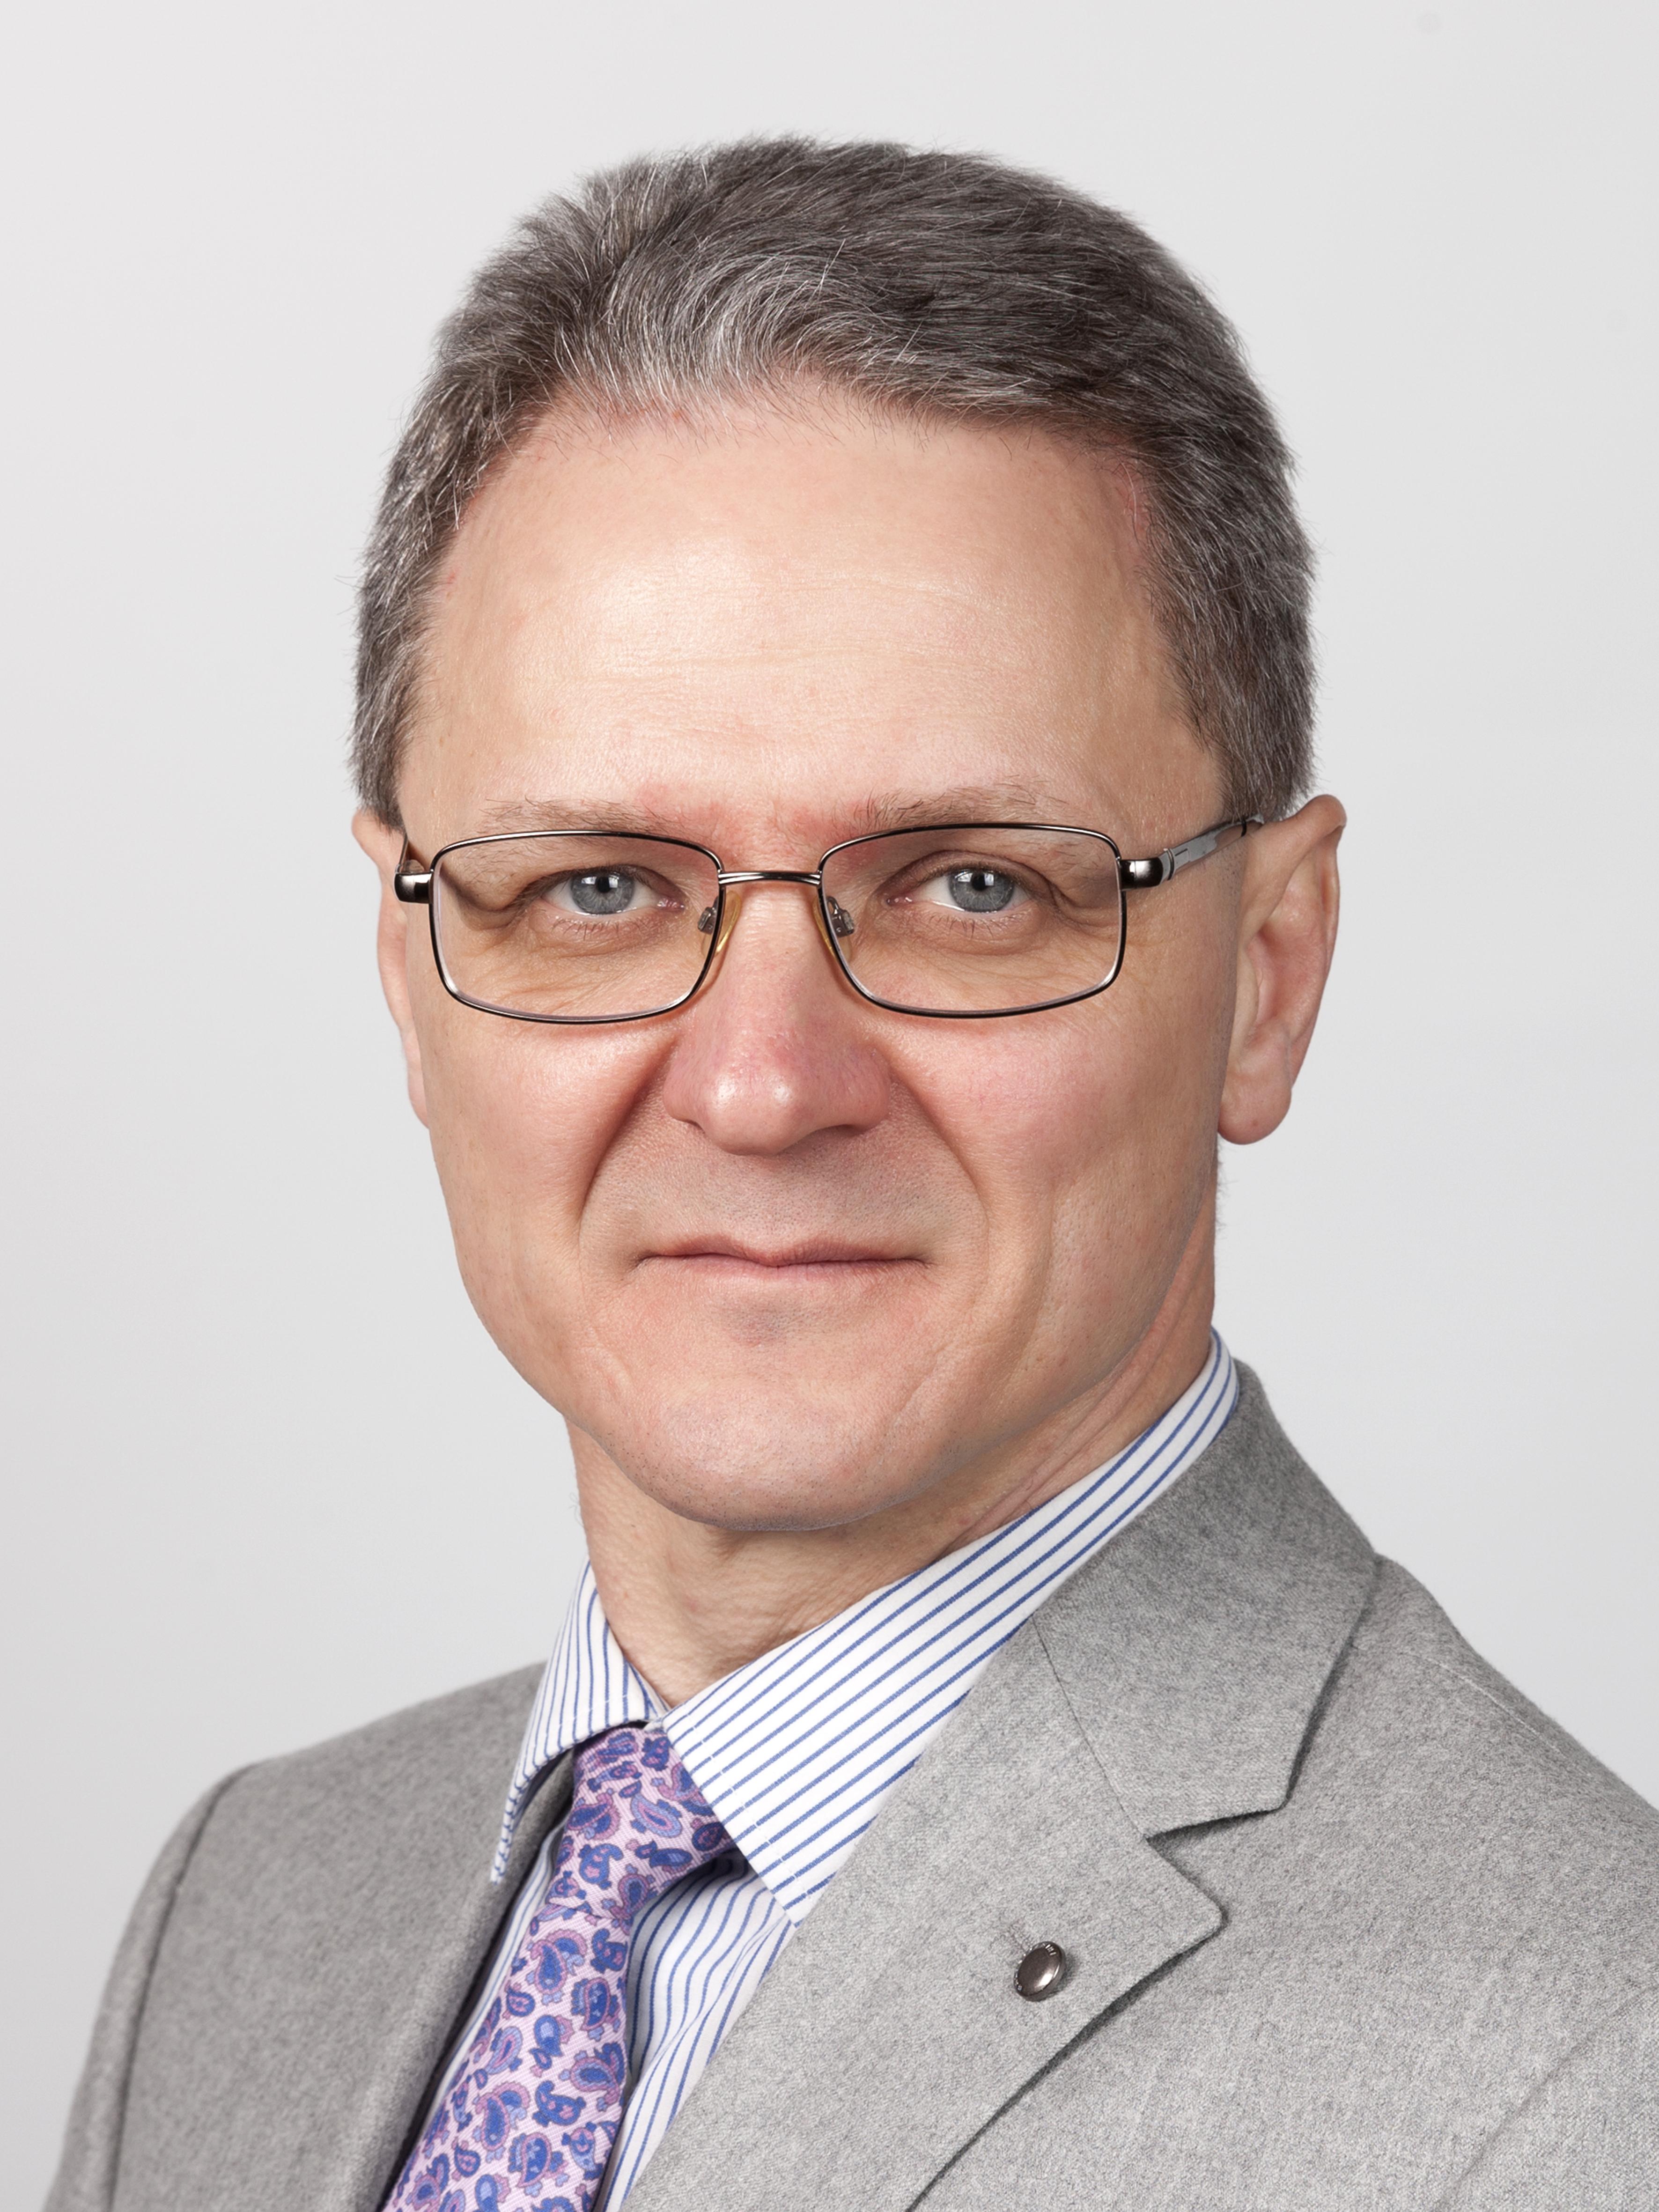 Ihor Stolyarchuk